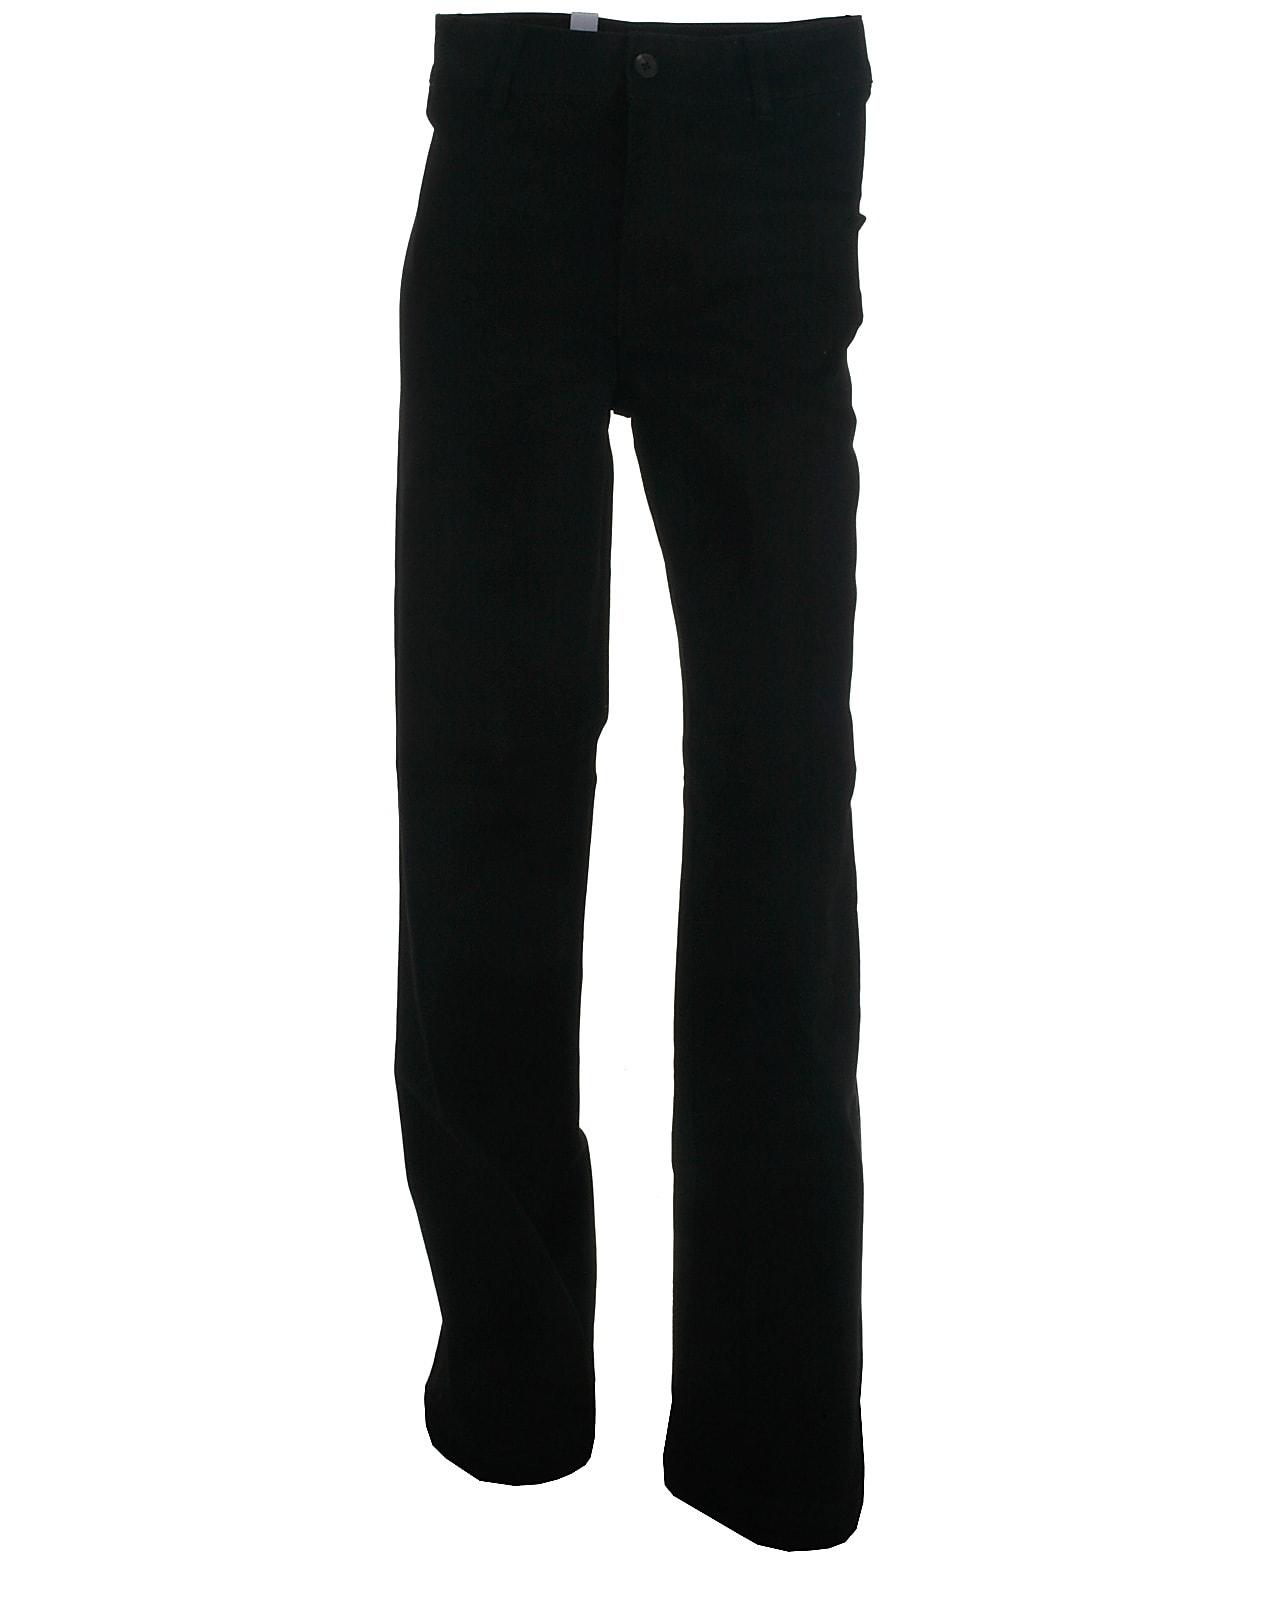 Image of Grunt wide pant, Wise, black